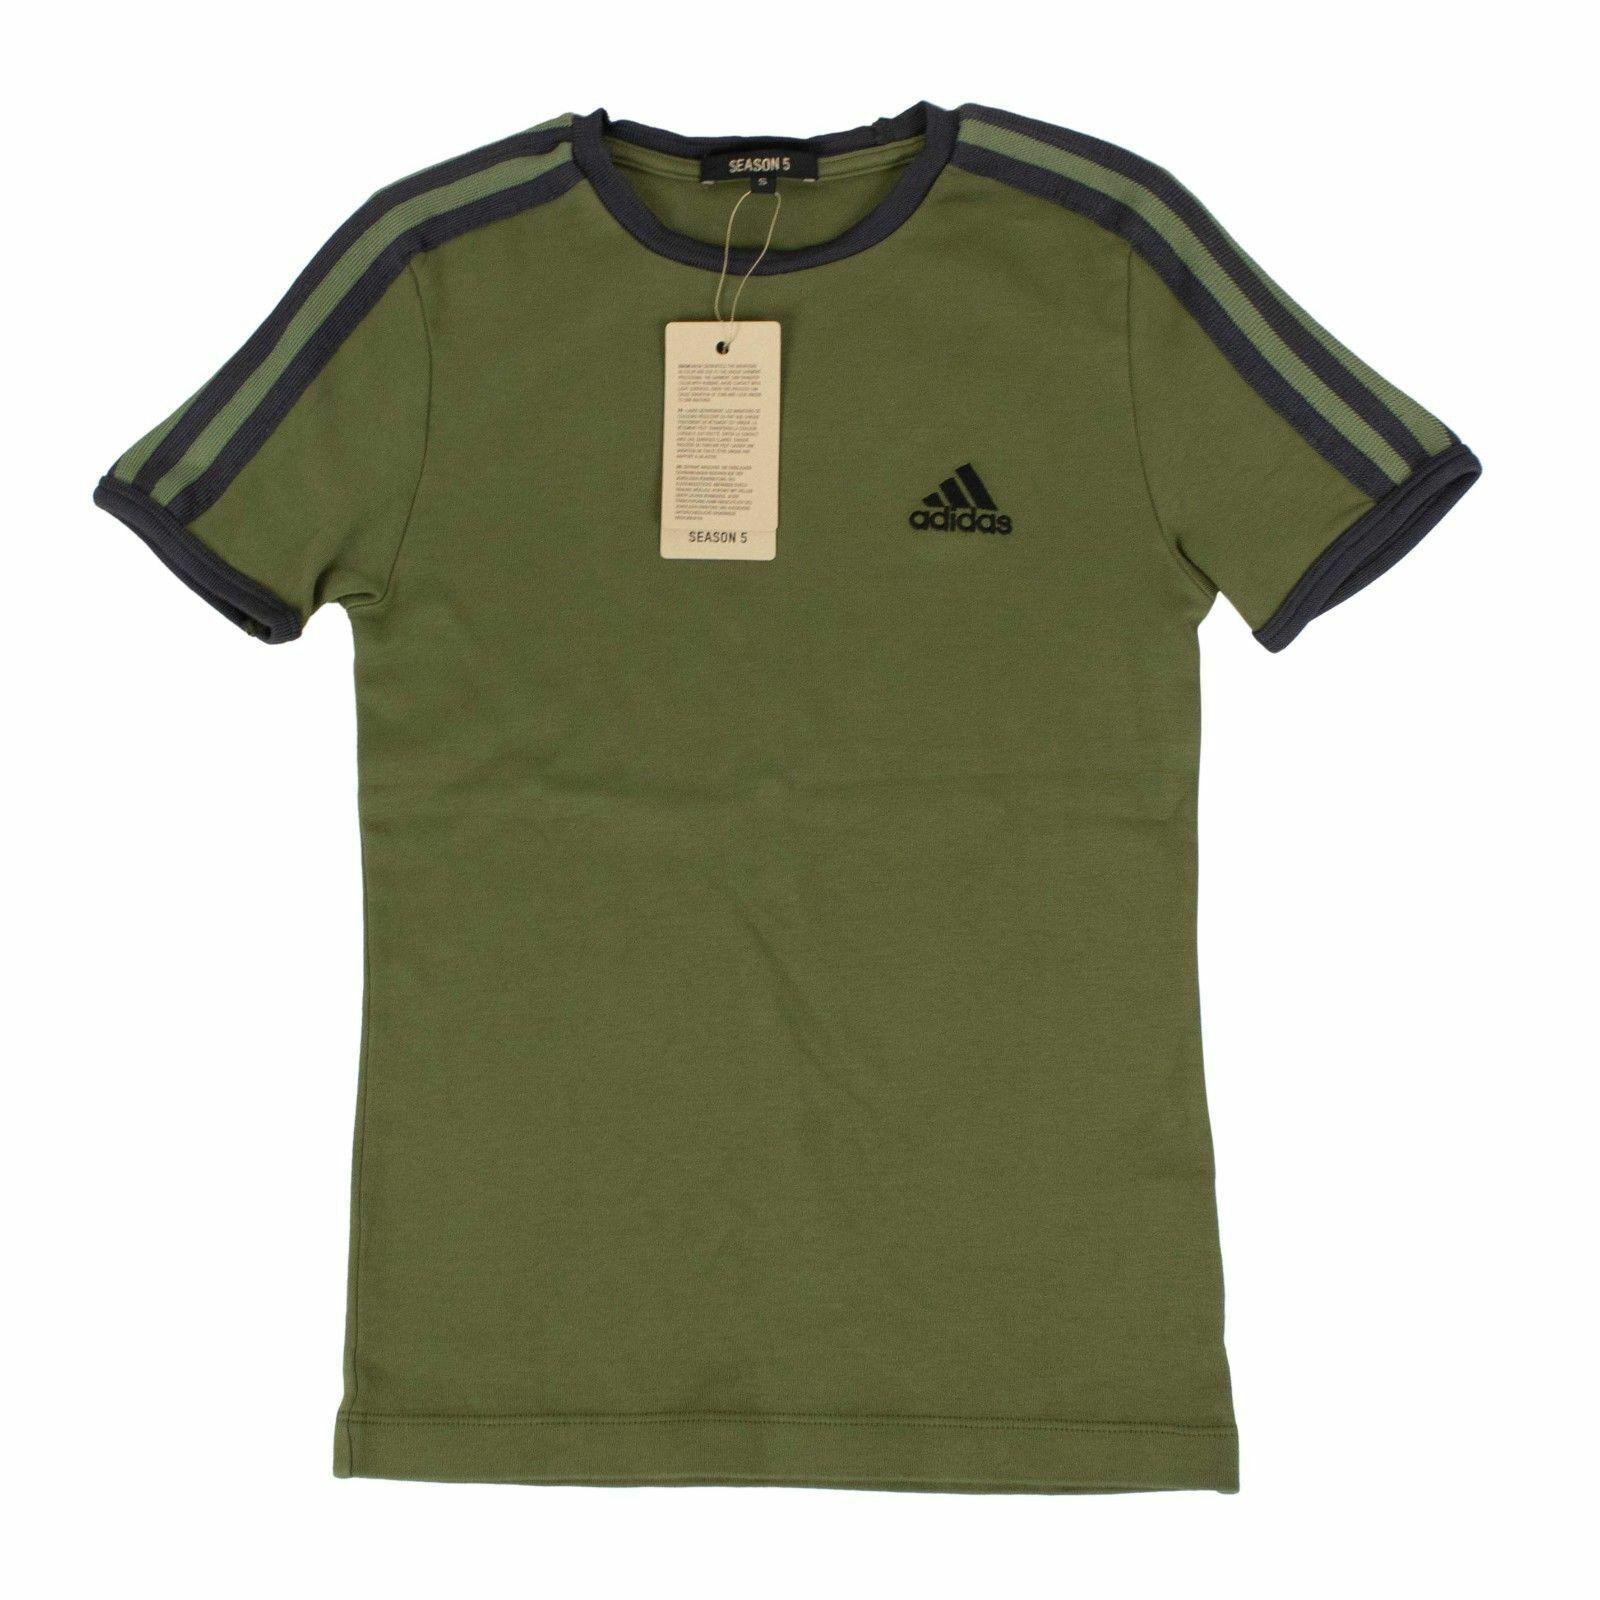 NWT YEEZY Season 5 Ranger Ink Grün Adidas Baby T-Shirt Größe S